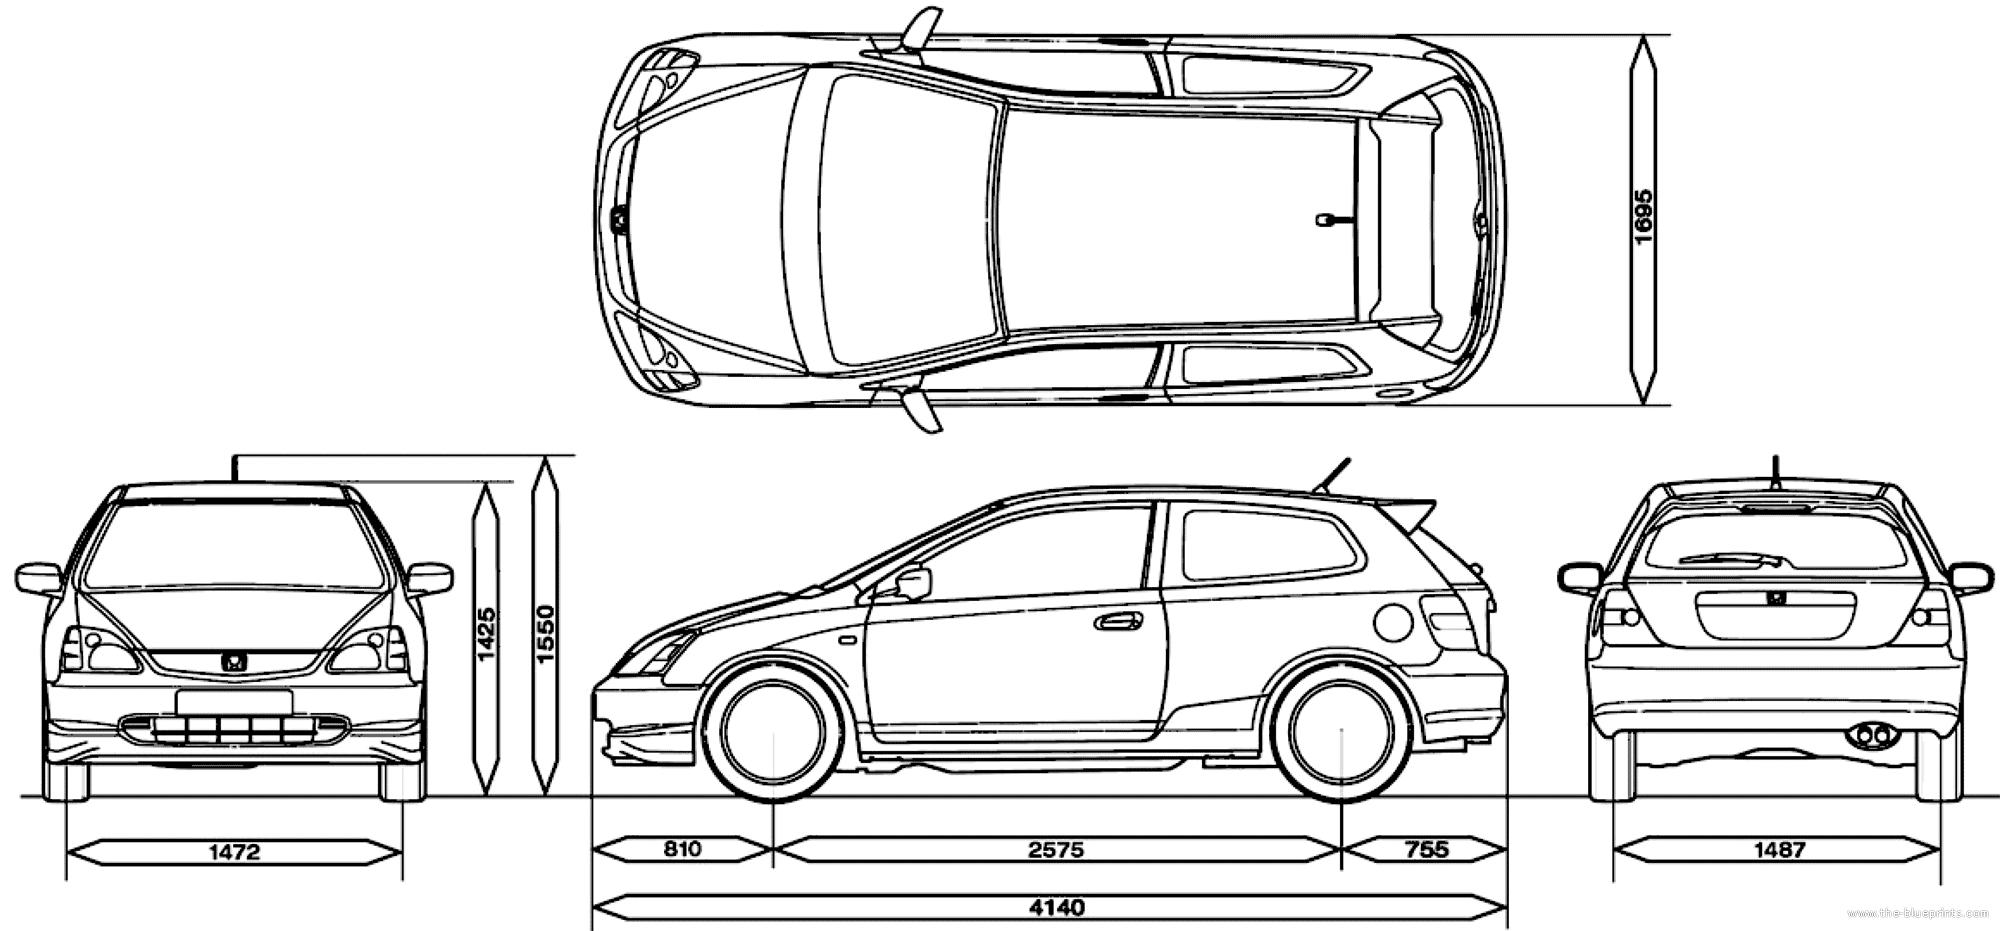 Blueprints Gt Cars Gt Honda Gt Honda Civic Type R